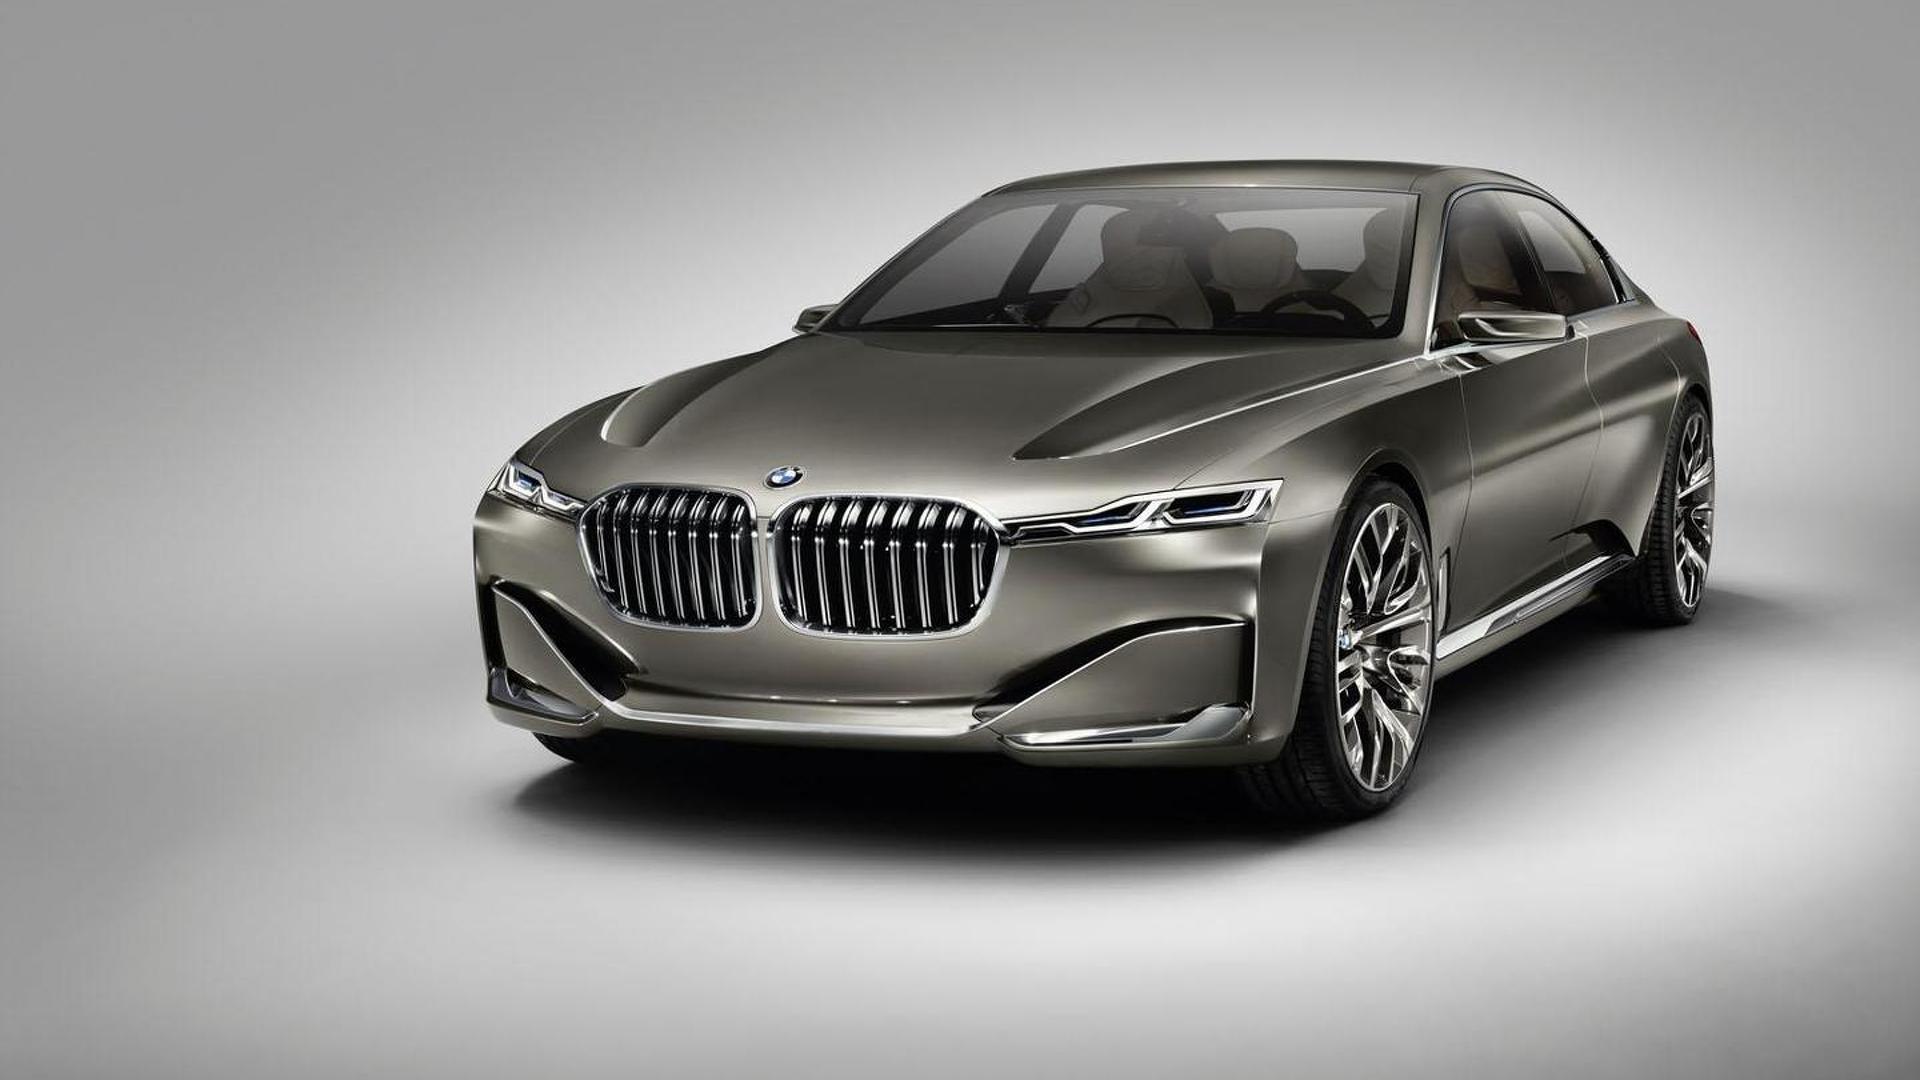 Bmw 9 Series Bmw New Car 2020